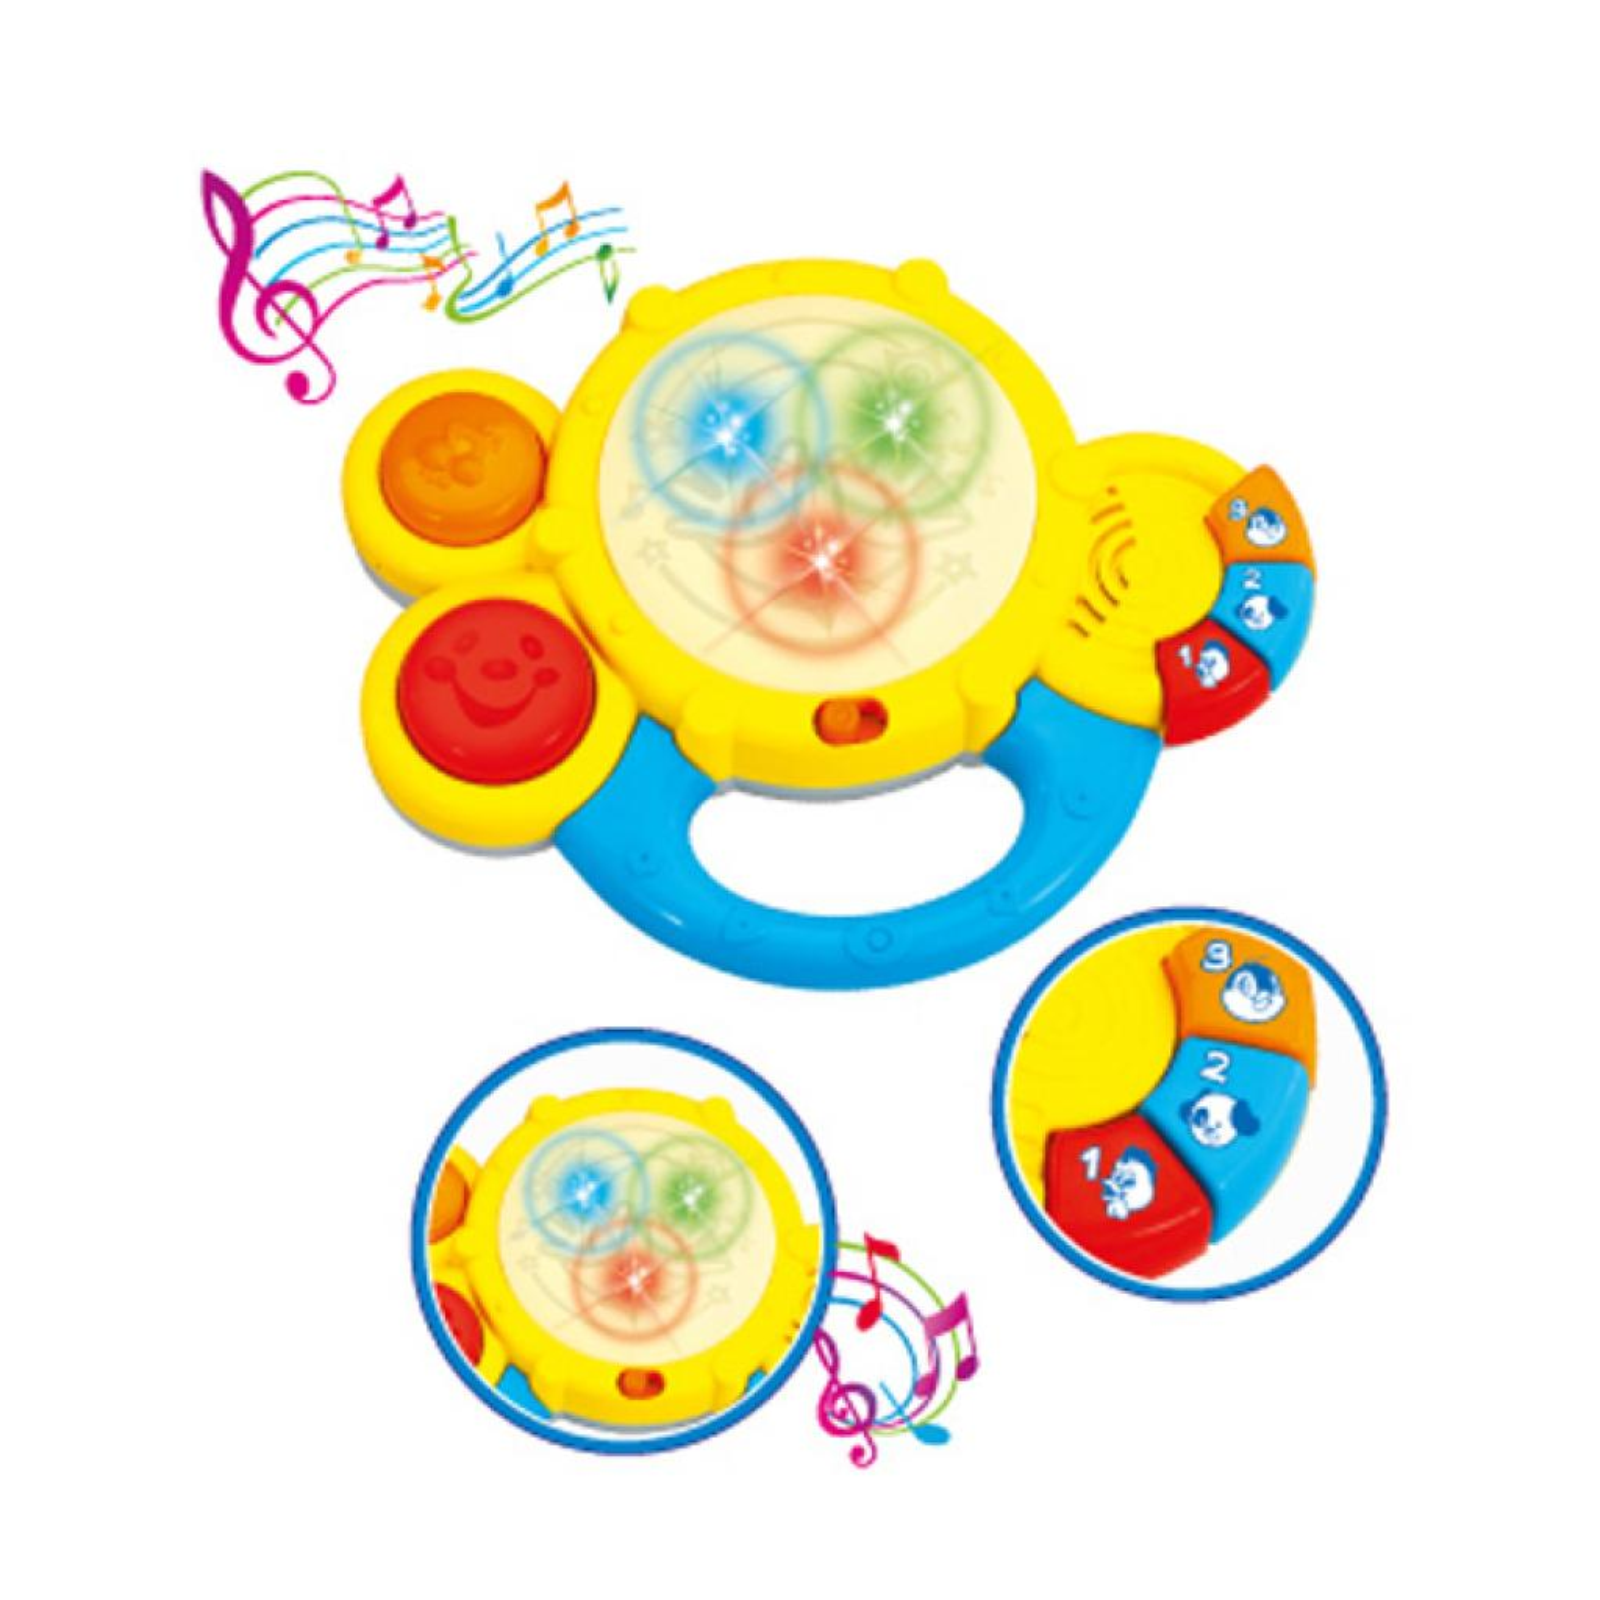 Музыкальная игрушка BeBeLino Музыкальный барабанчик бело-желтый (57067-2) изображение 2